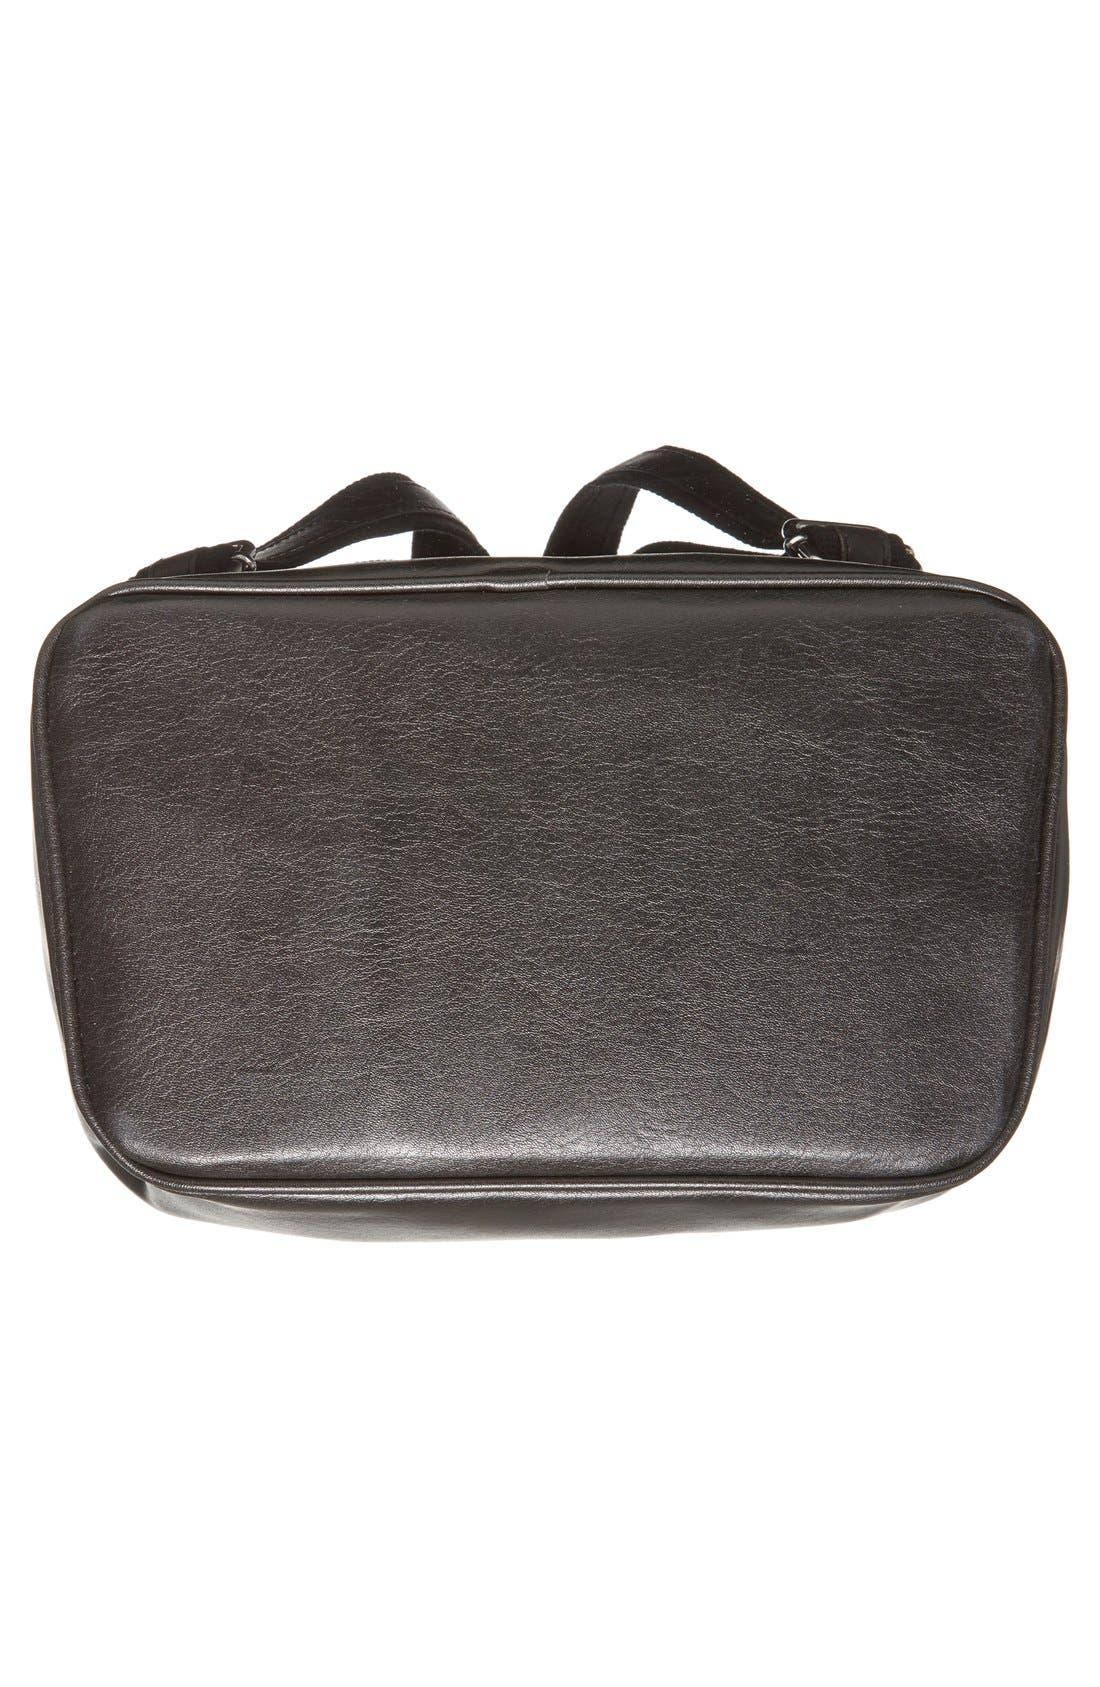 'Fabi' Faux Leather Laptop Backpack,                             Alternate thumbnail 6, color,                             BLACK